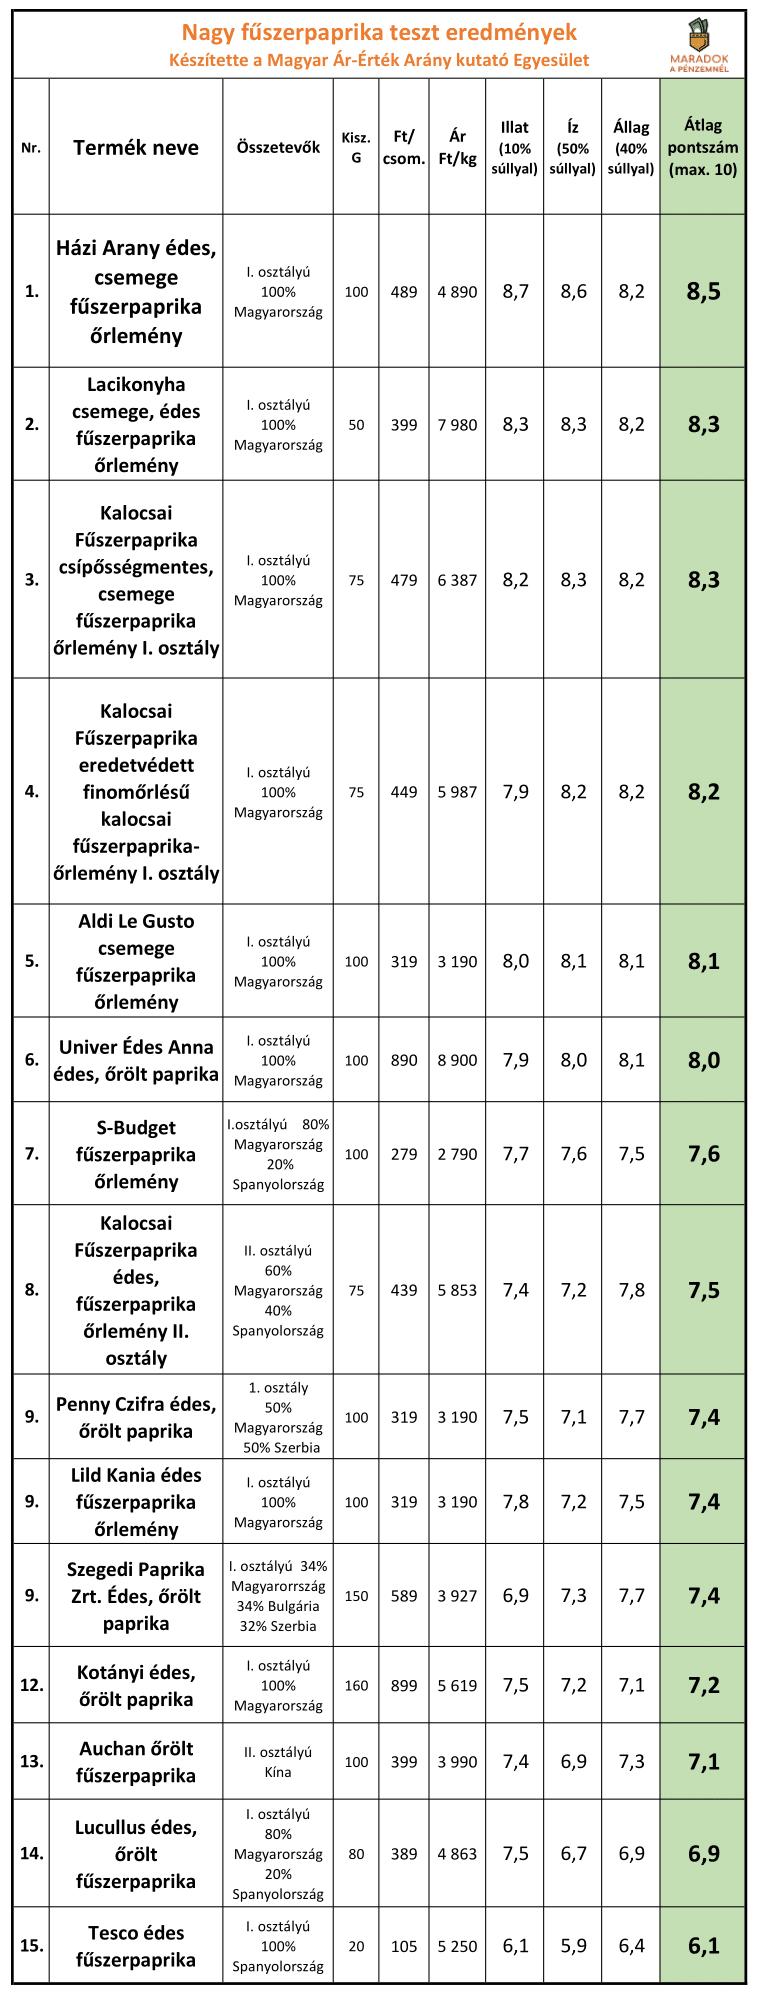 pirospaprika_teszt-1_1.png